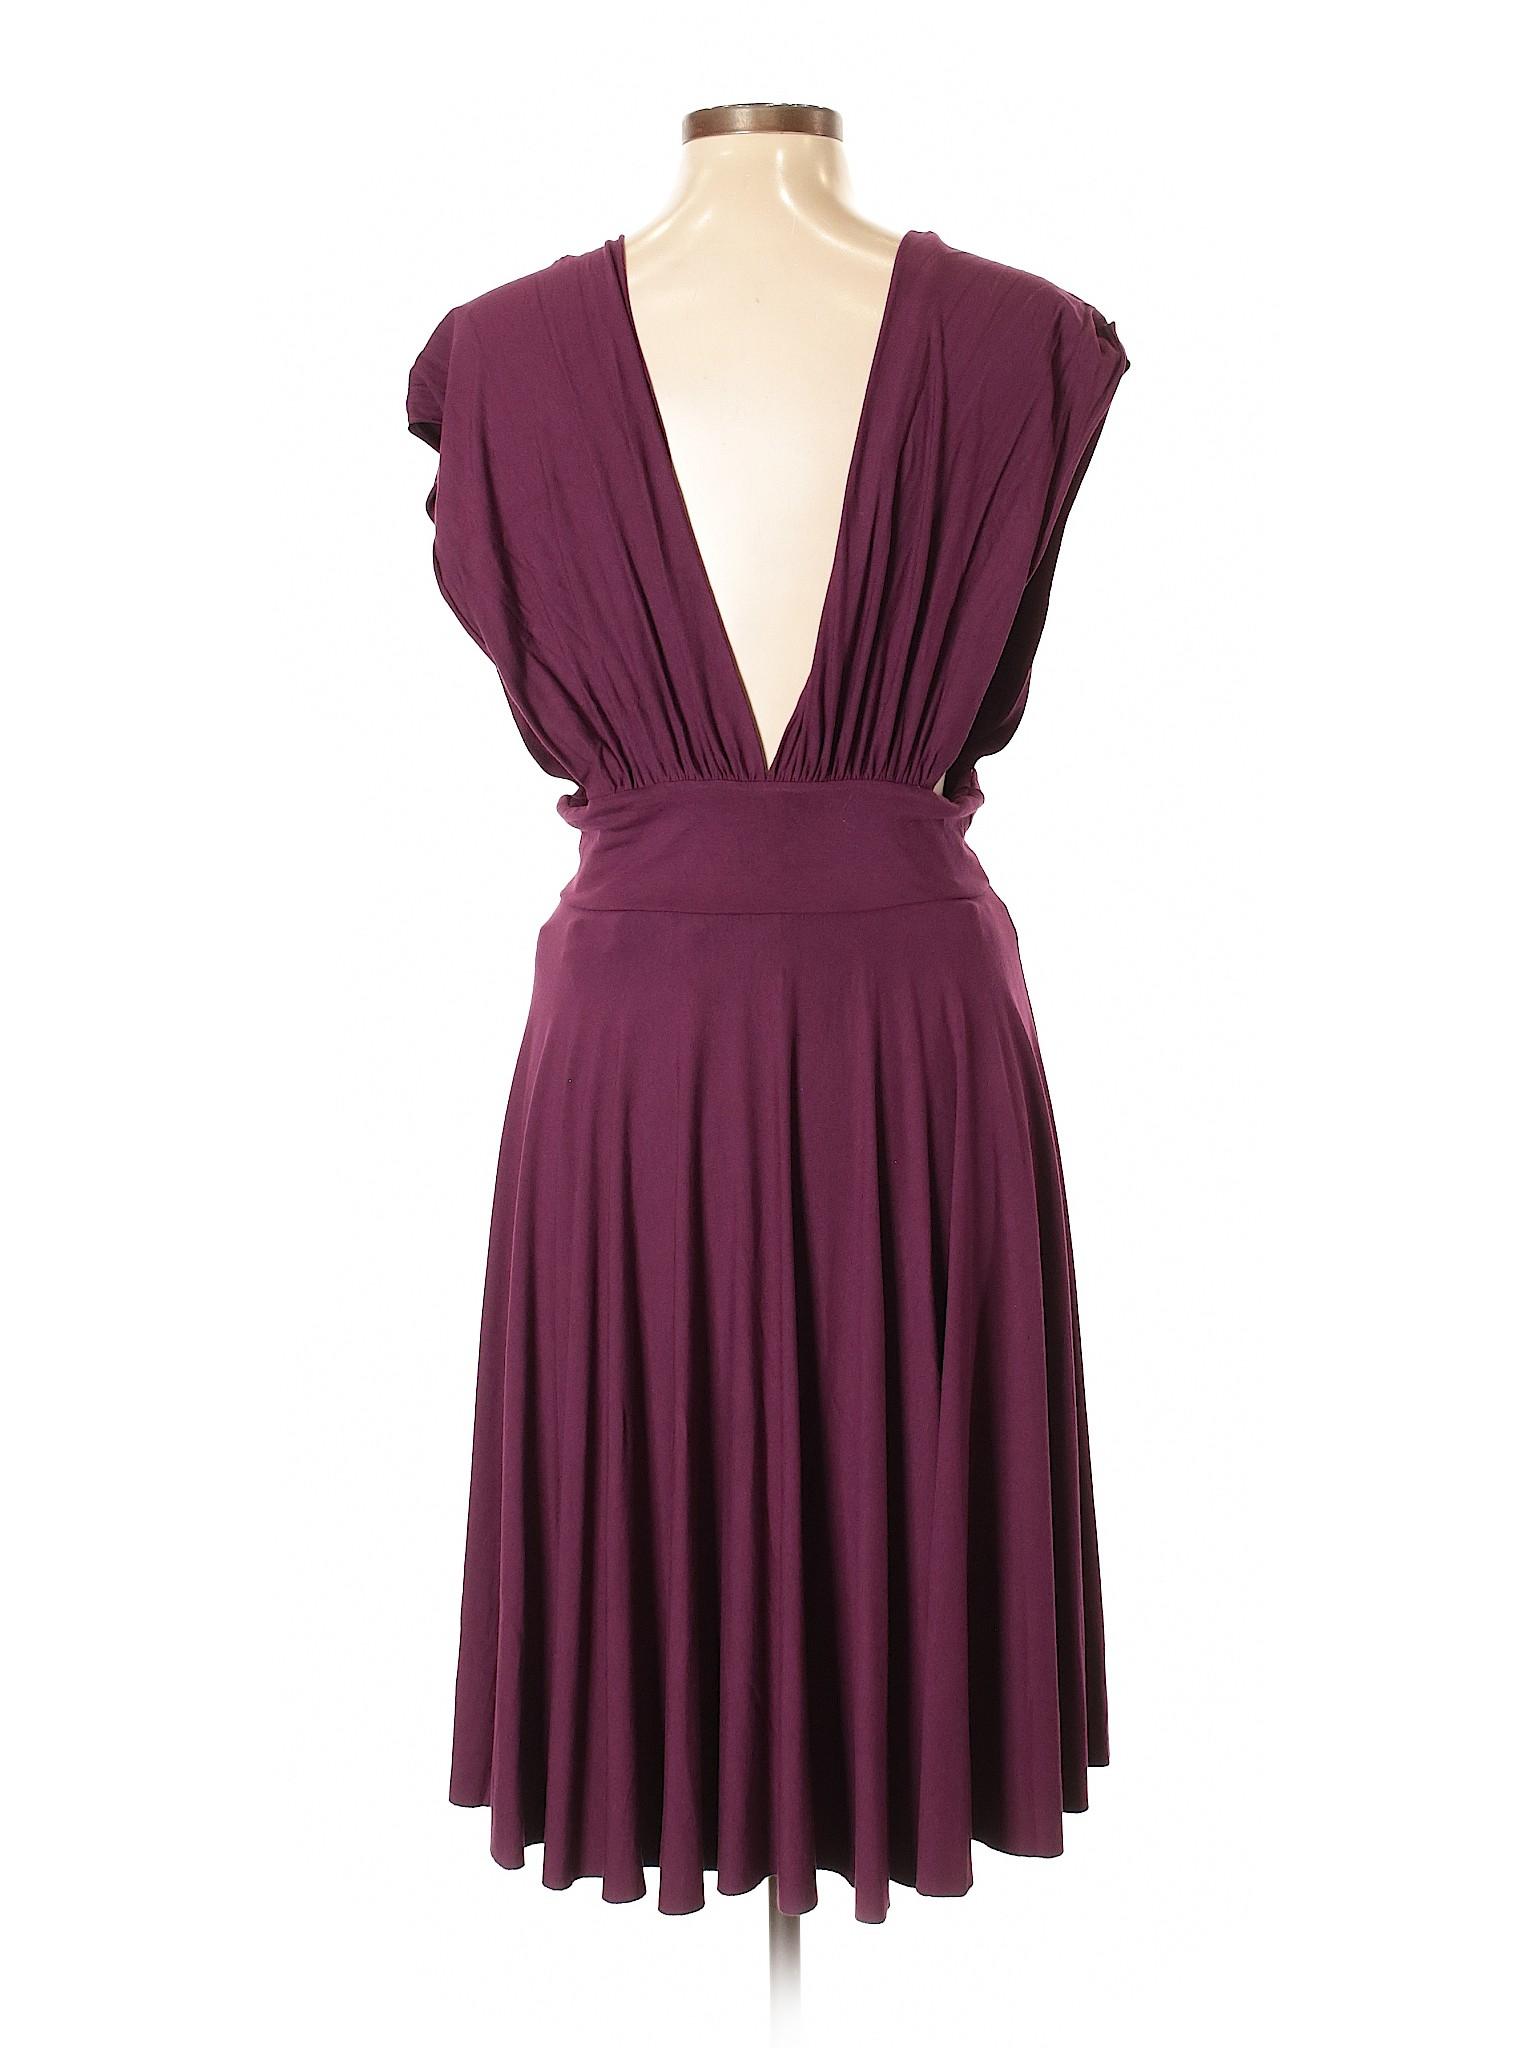 Black Dress winter Casual Market House White Boutique wxF6q7B4